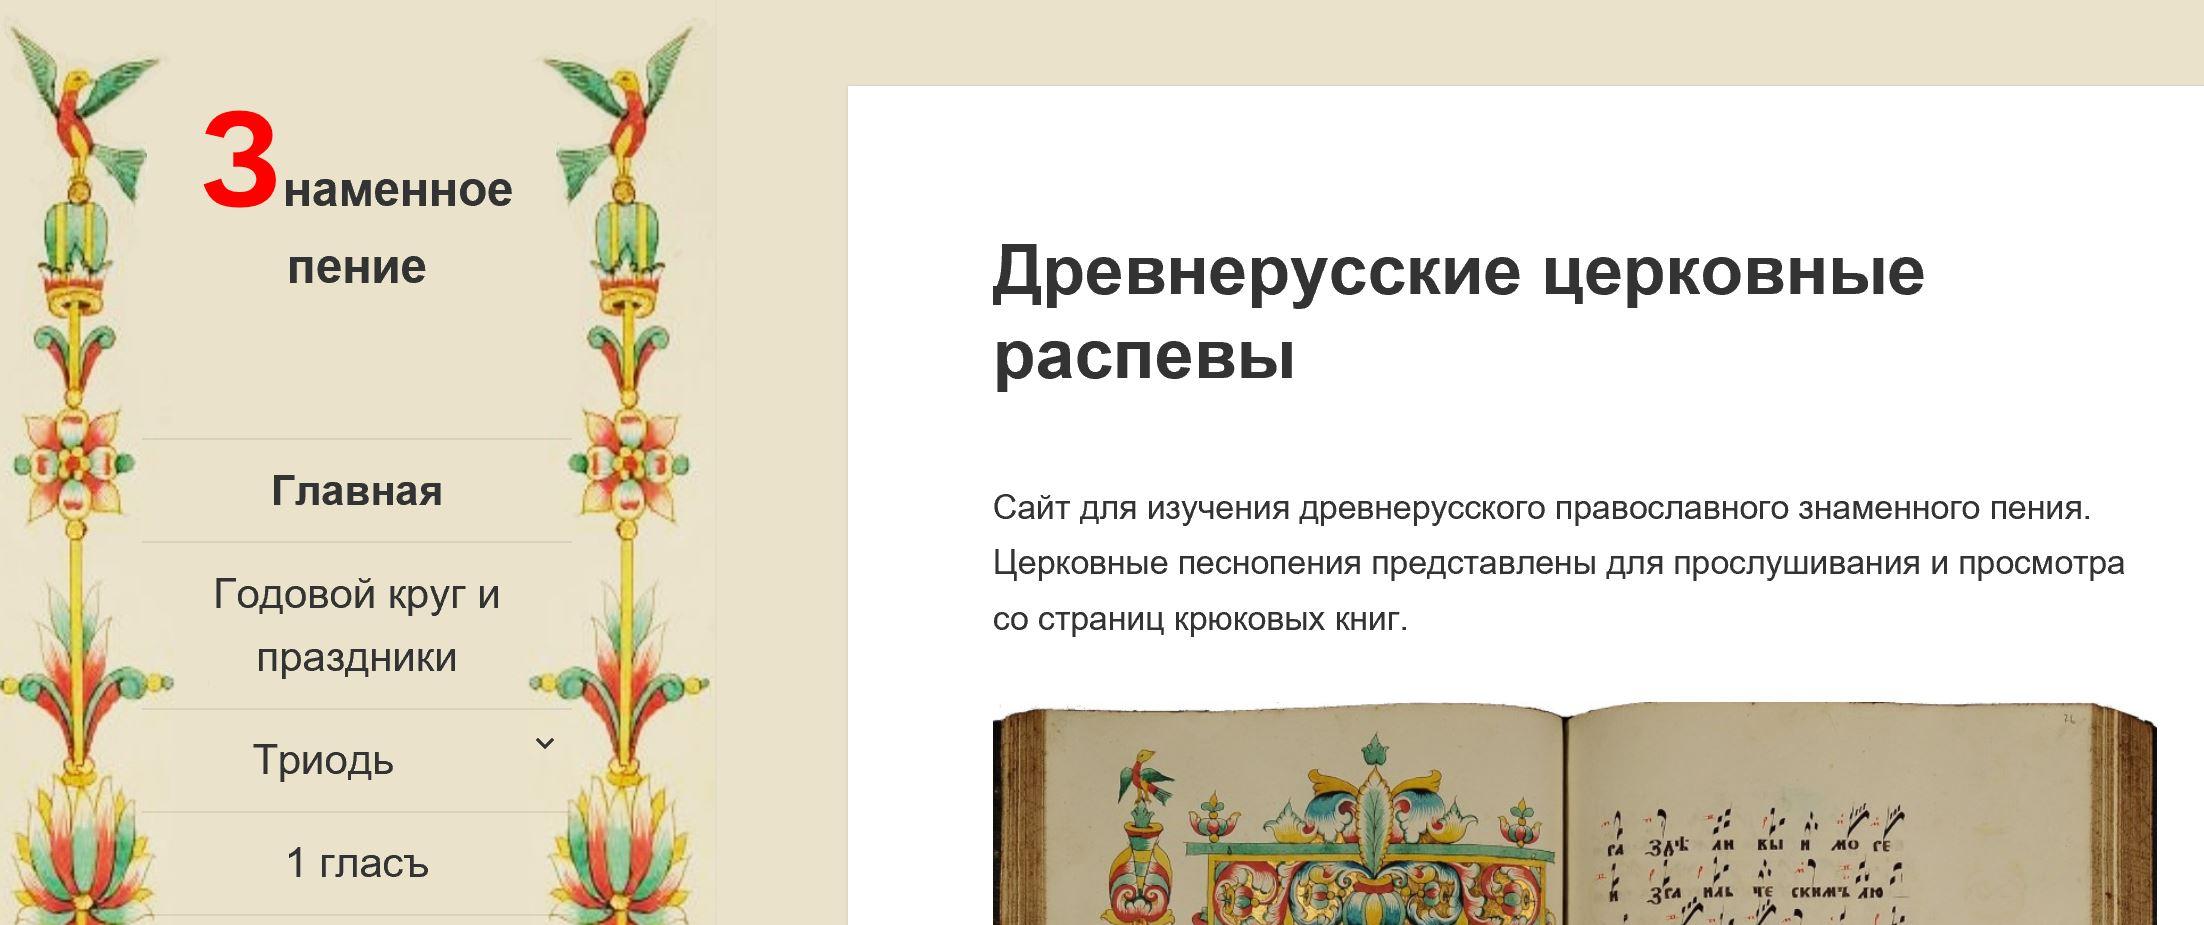 znamennoe.ru, знаменное пение, РПСЦ, старообрядцы, интернет